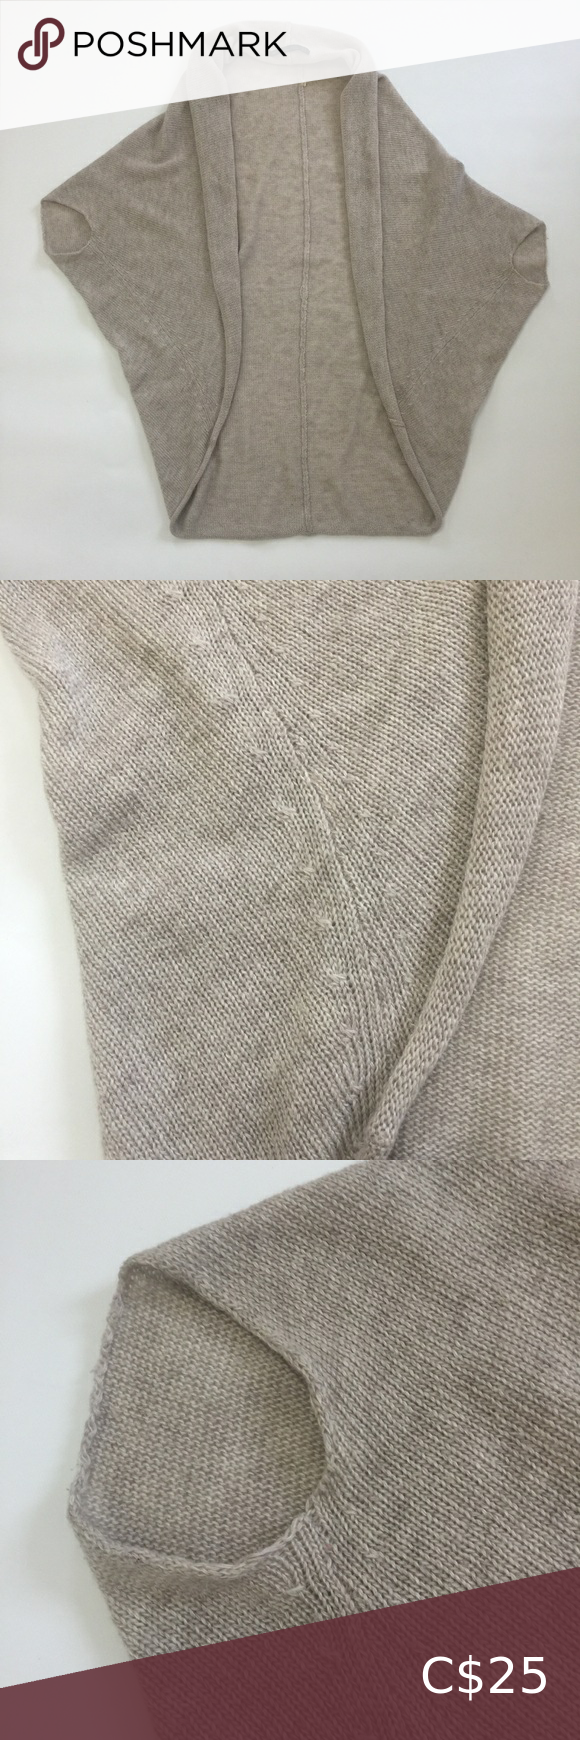 Photo of Zara Knit oversized cape like cardigan